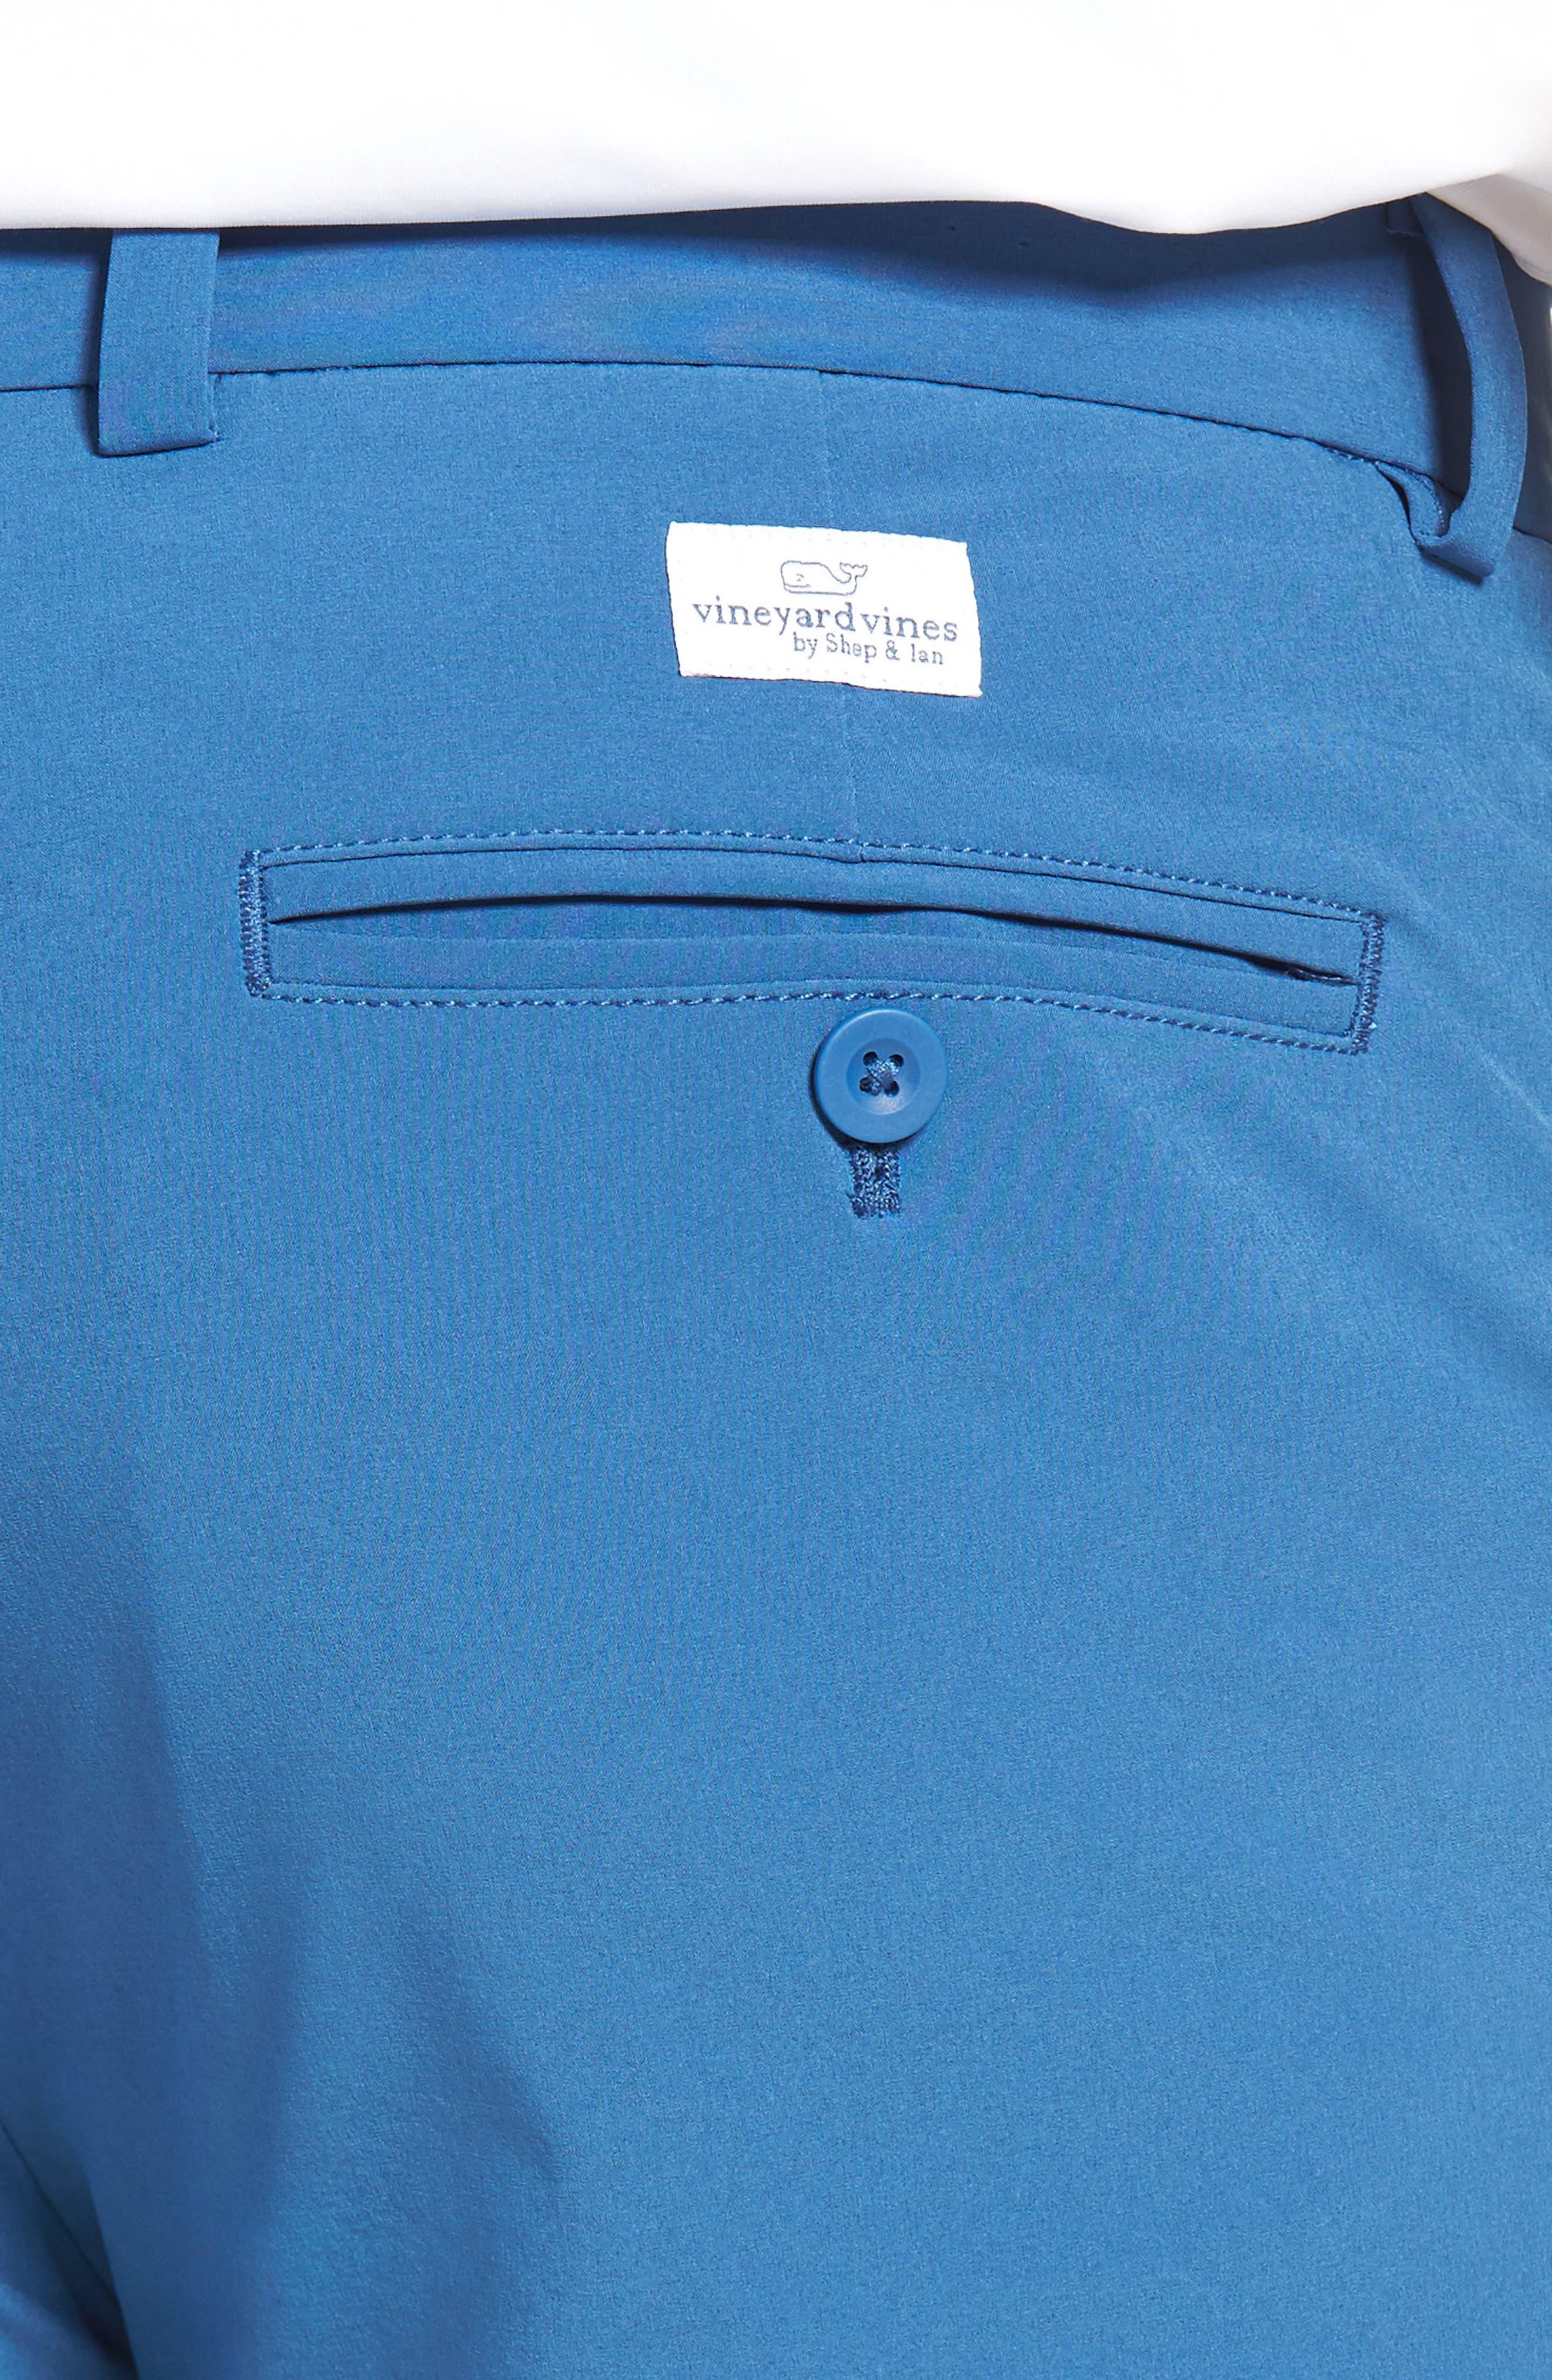 8 Inch Performance Breaker Shorts,                             Alternate thumbnail 56, color,